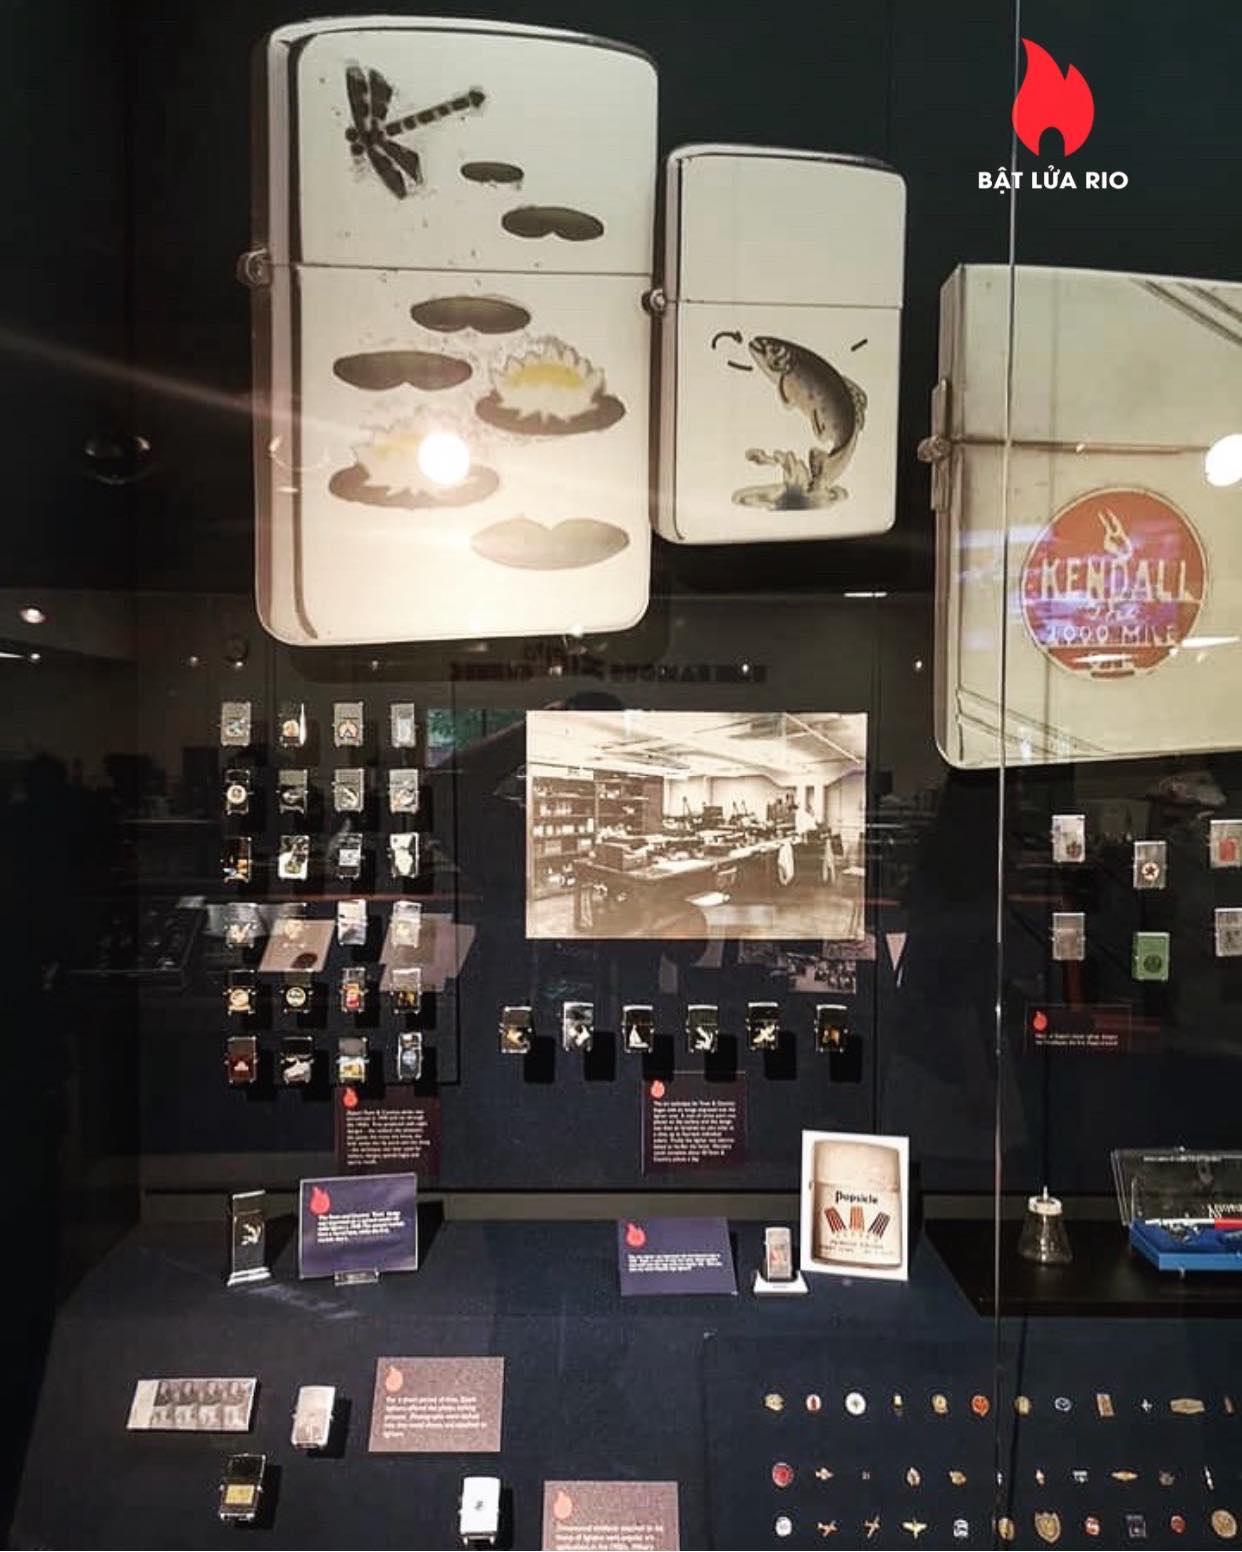 THAM QUAN BẢO TÀNG ZIPPO/CASE - ZIPPO/CASE MUSEUM 119